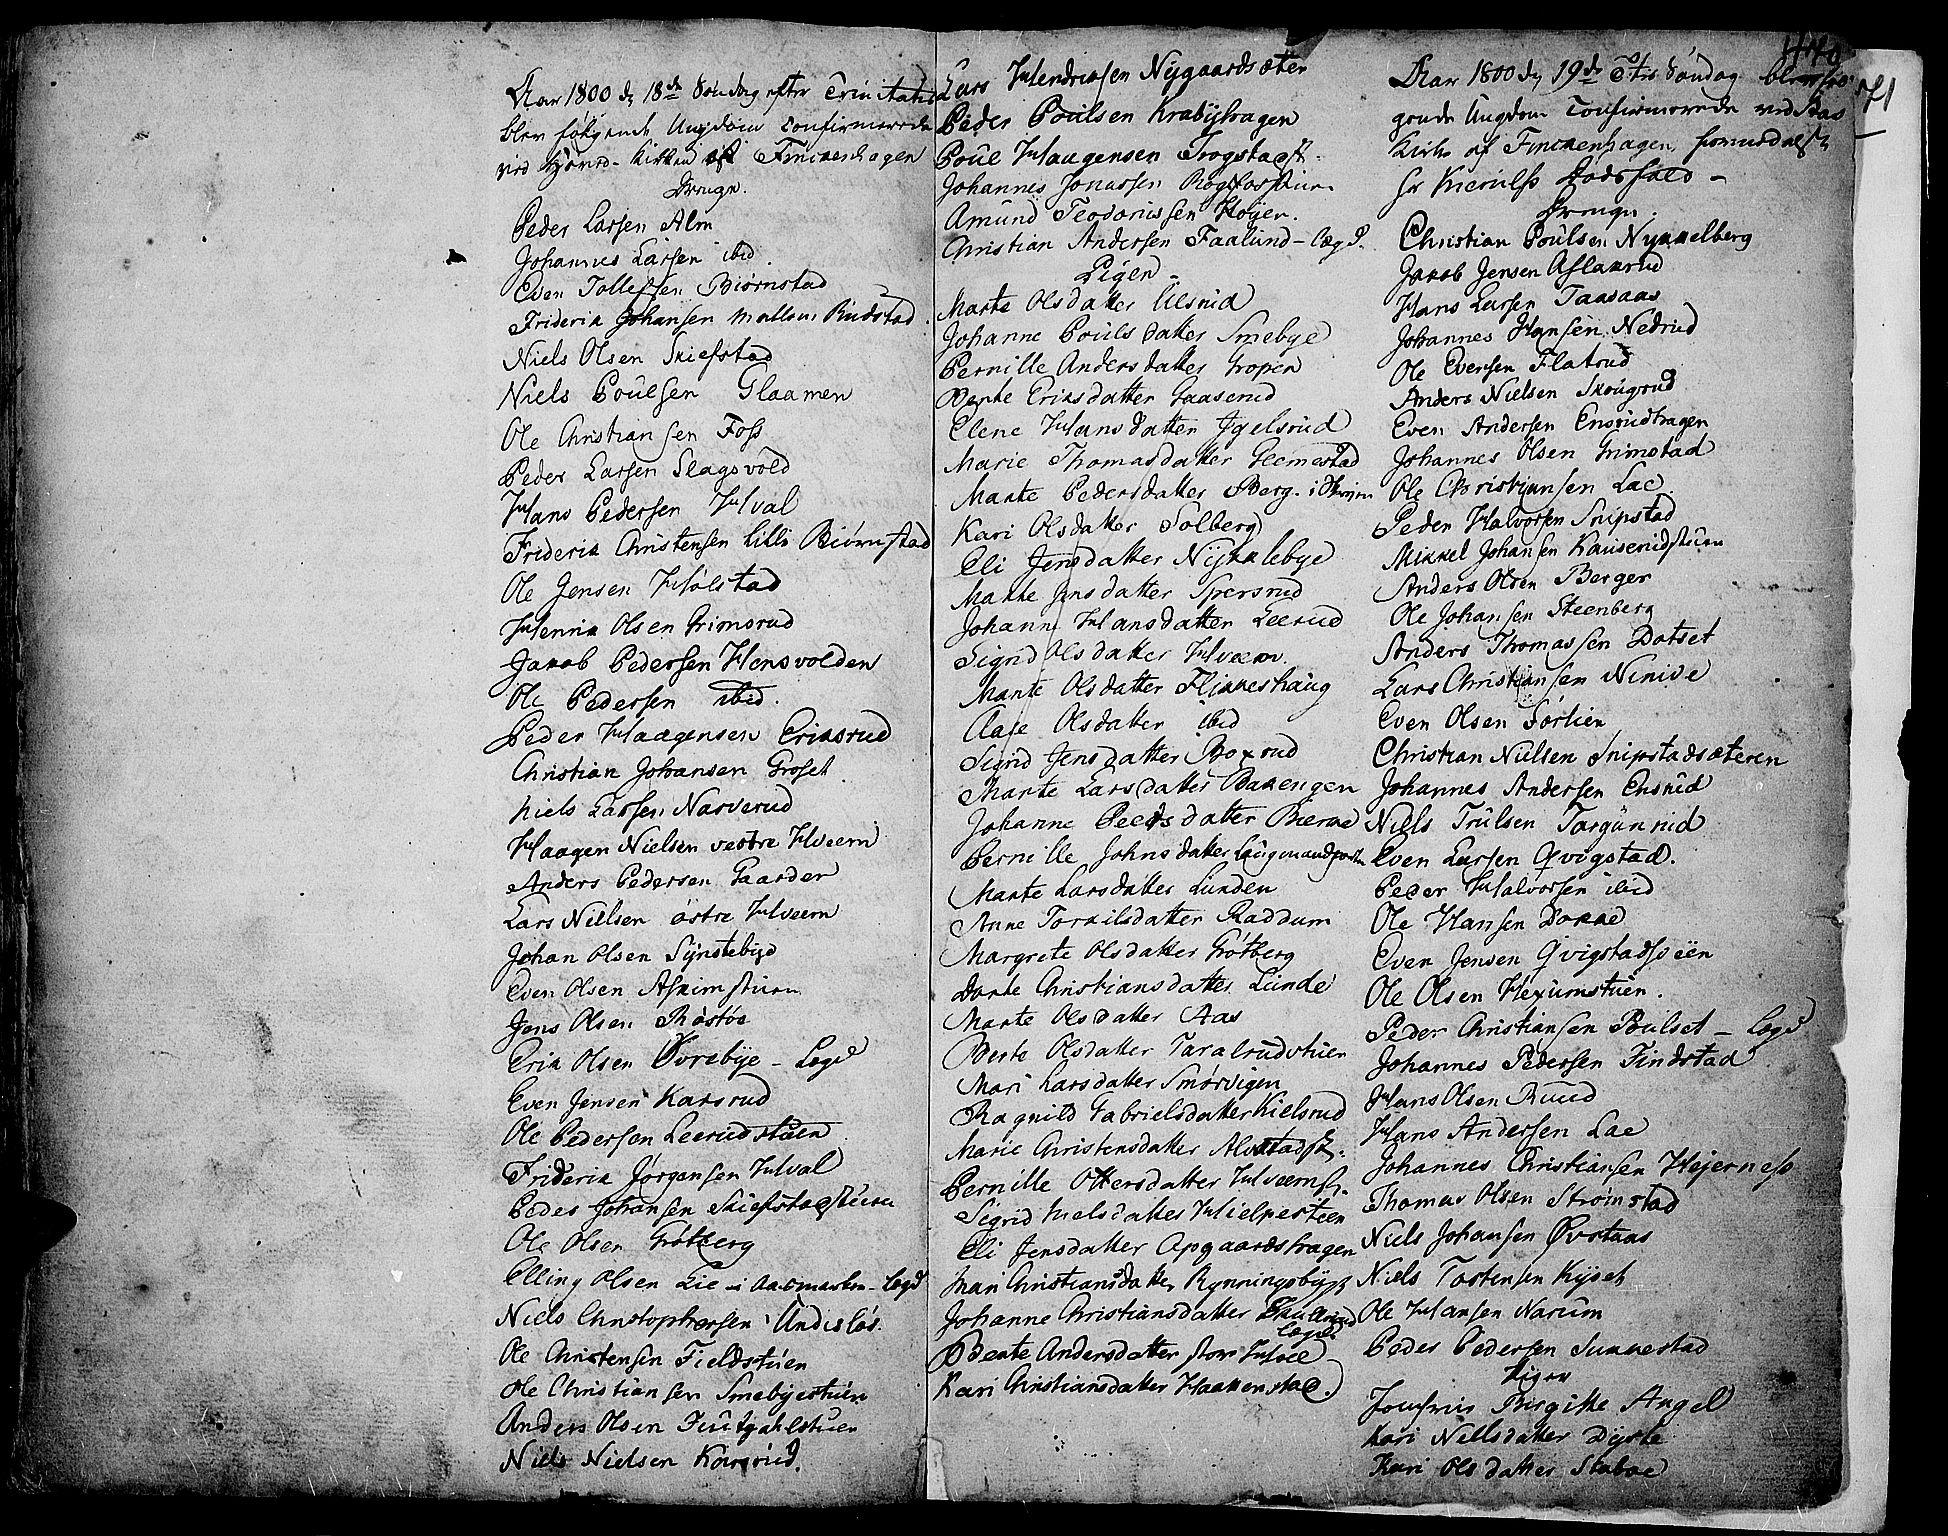 SAH, Toten prestekontor, Ministerialbok nr. 7, 1794-1809, s. 470